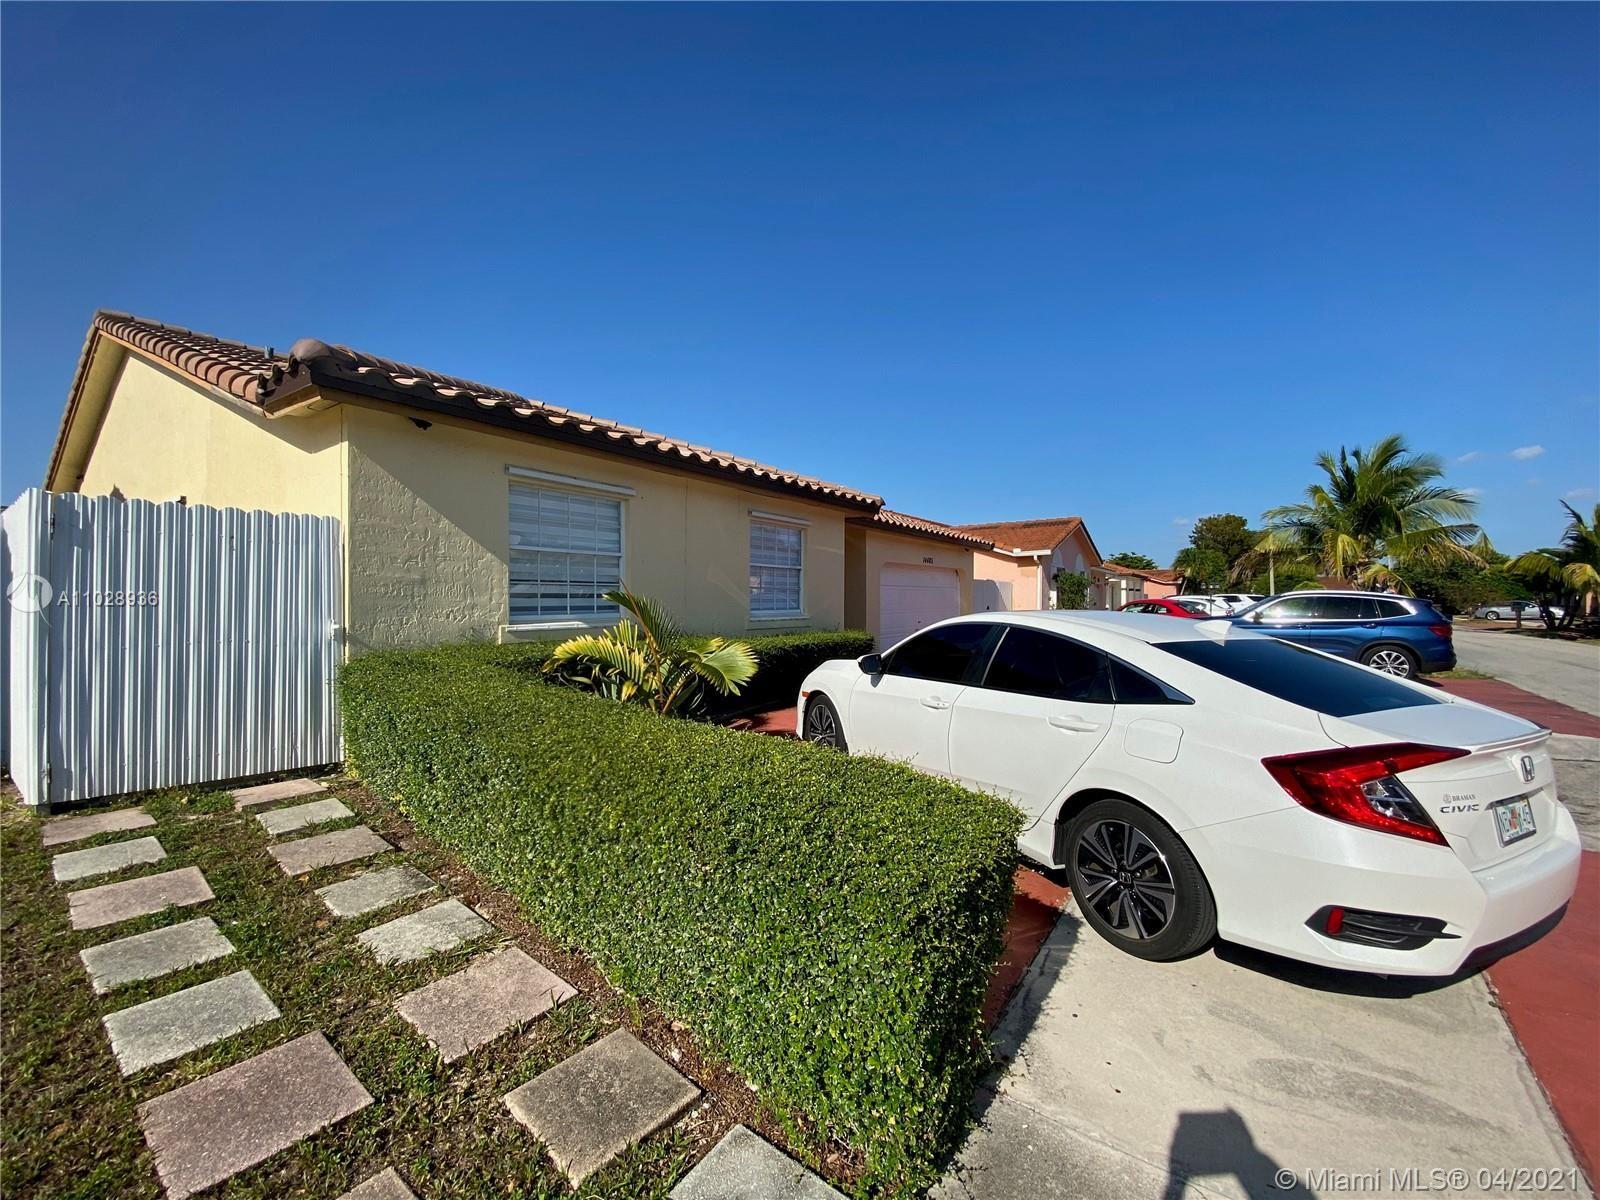 Photo of 14485 SW 173rd St, Miami, FL 33177 (MLS # A11028936)